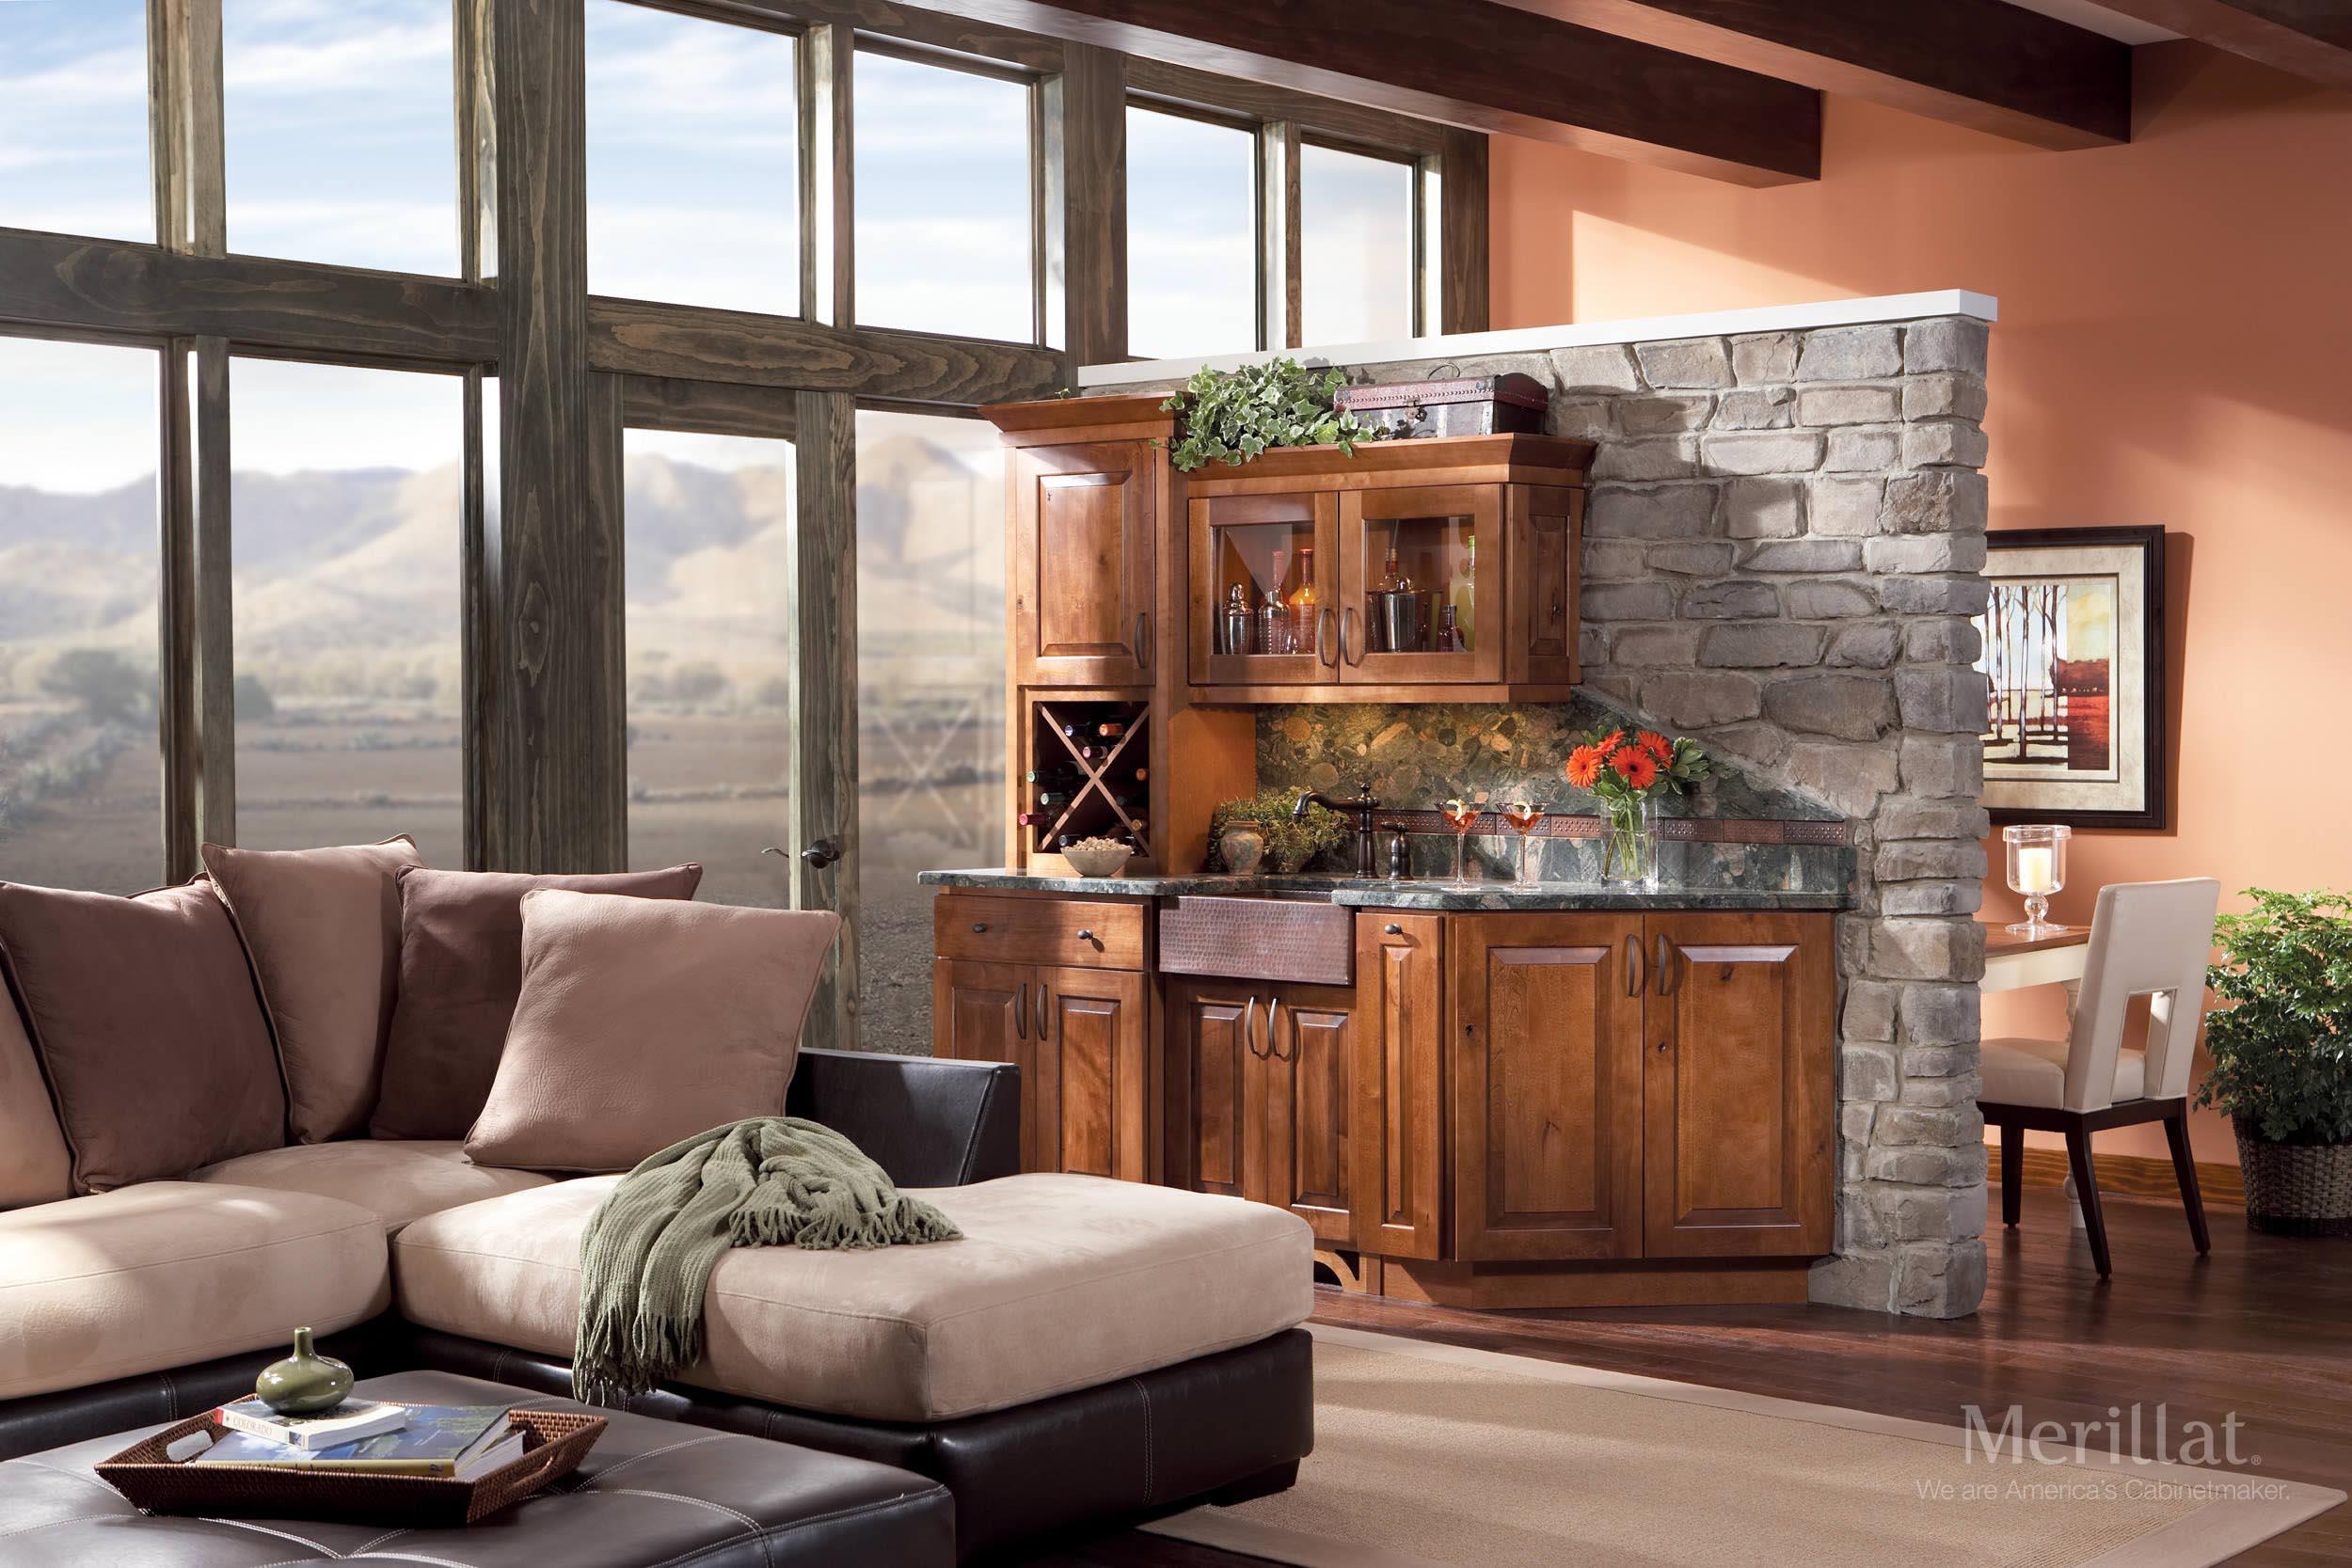 Charmant CraftwoodProducts.com Merillat 0090 Lg